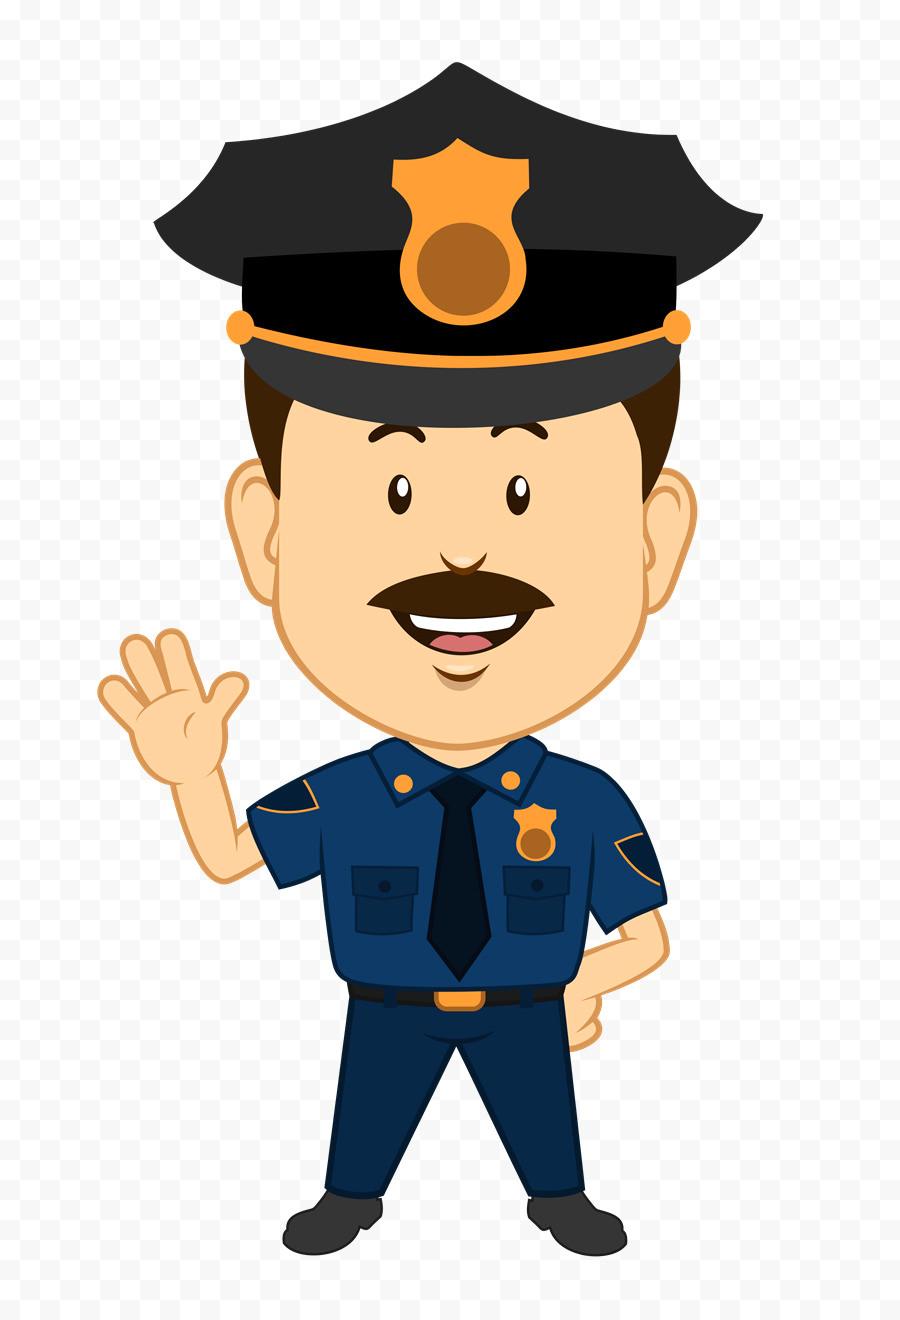 900x1320 Police Officer Clipart 1 Clip Art